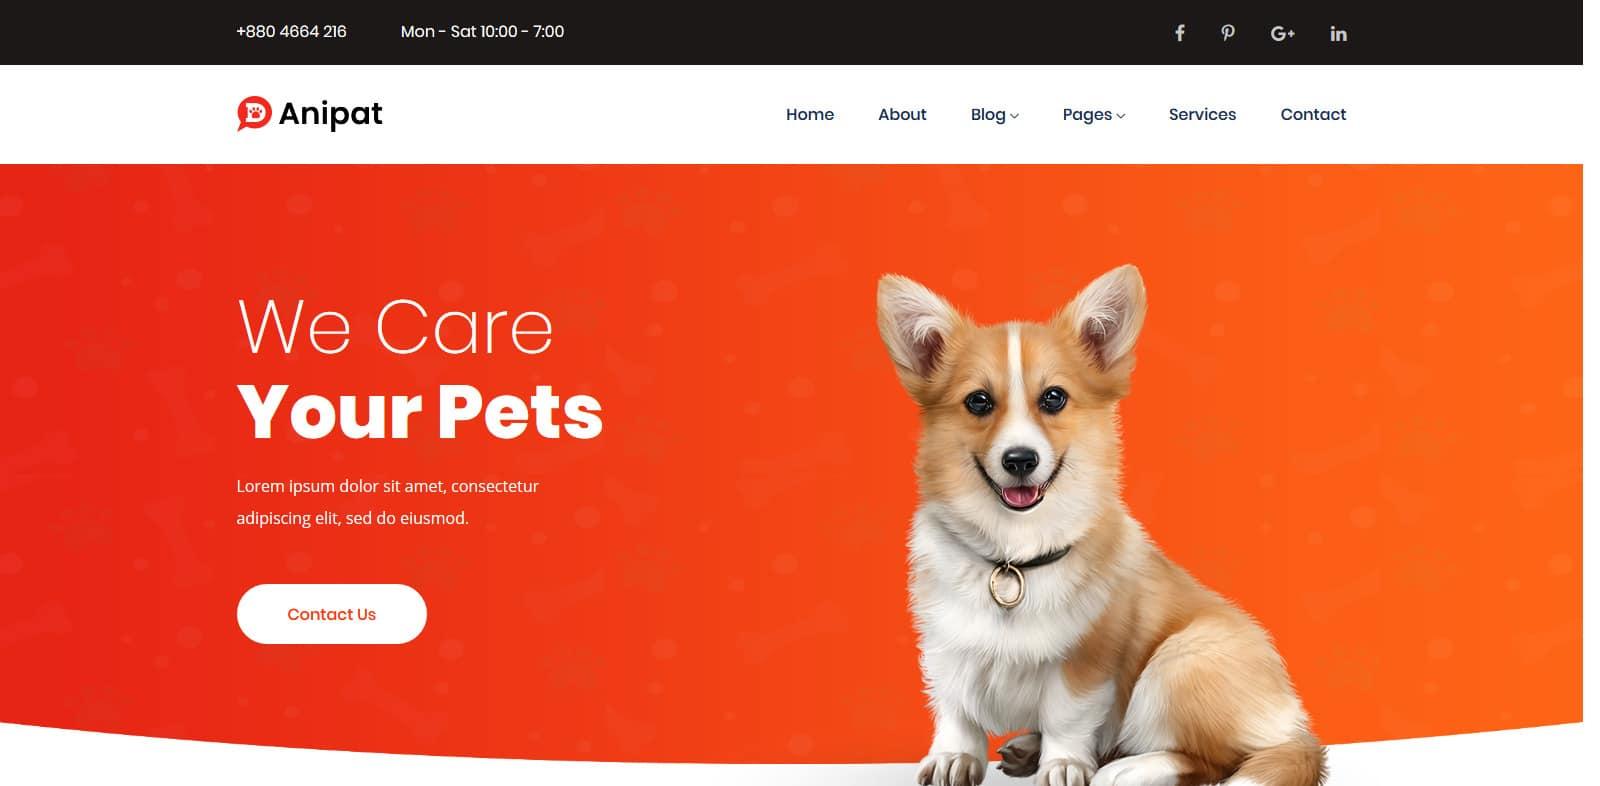 anipat-animal-website-template